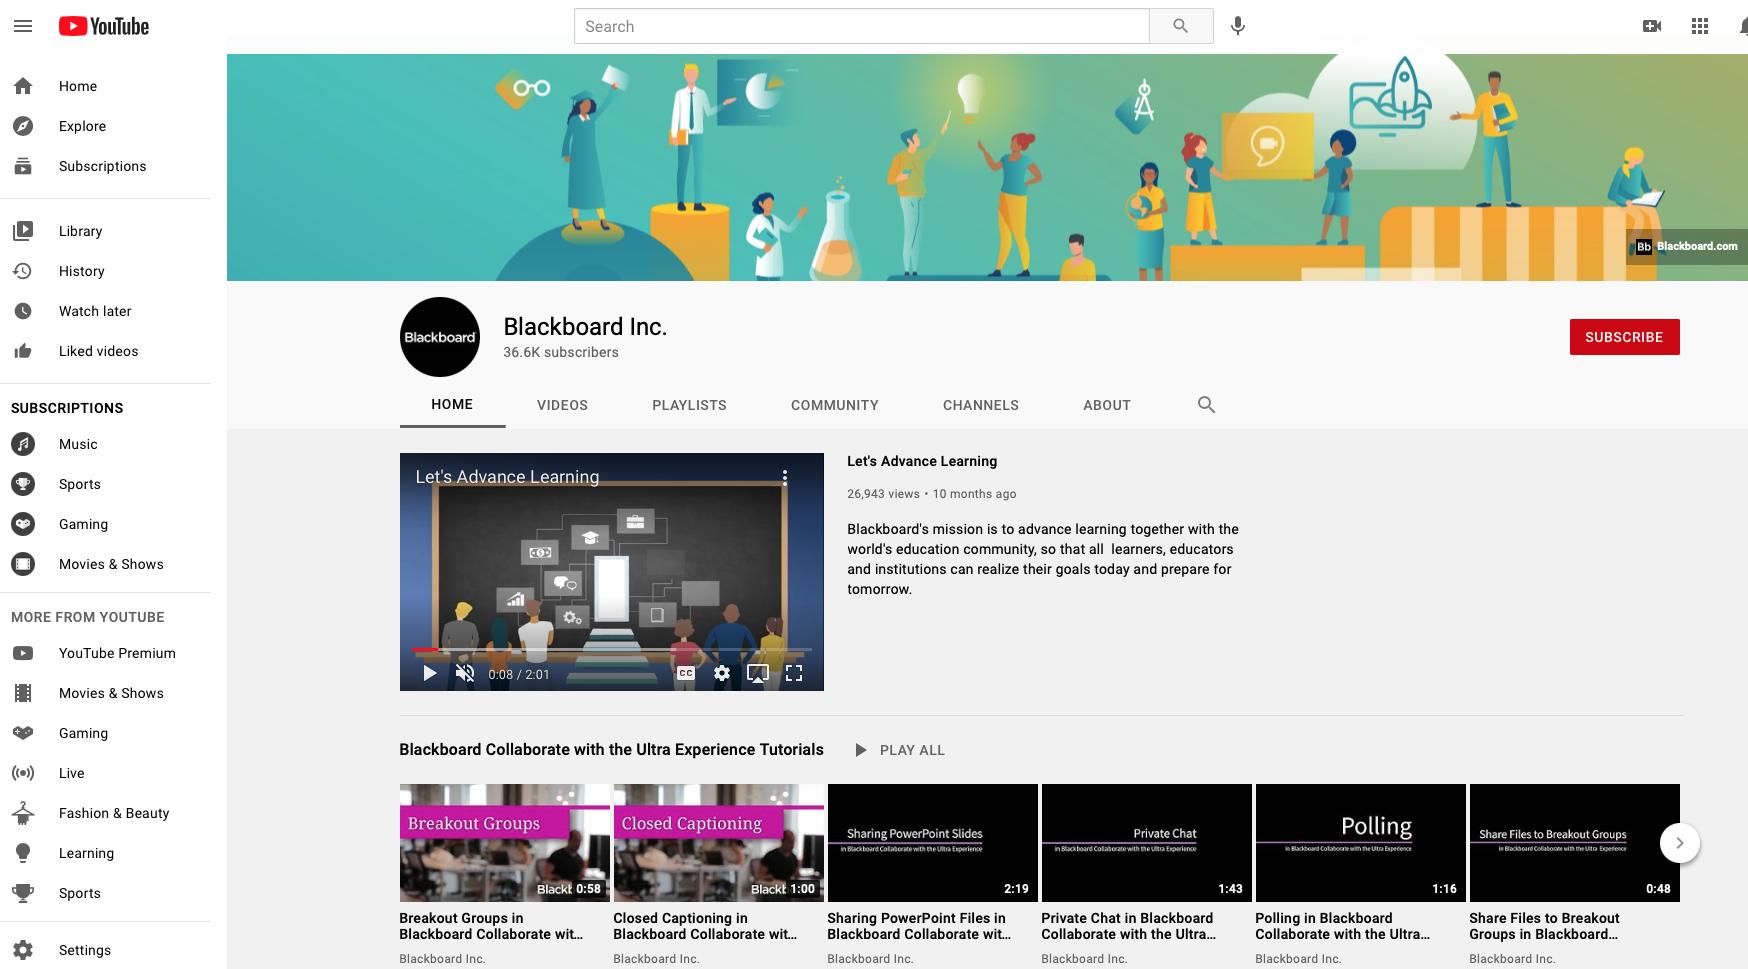 Blackboard on YouTube